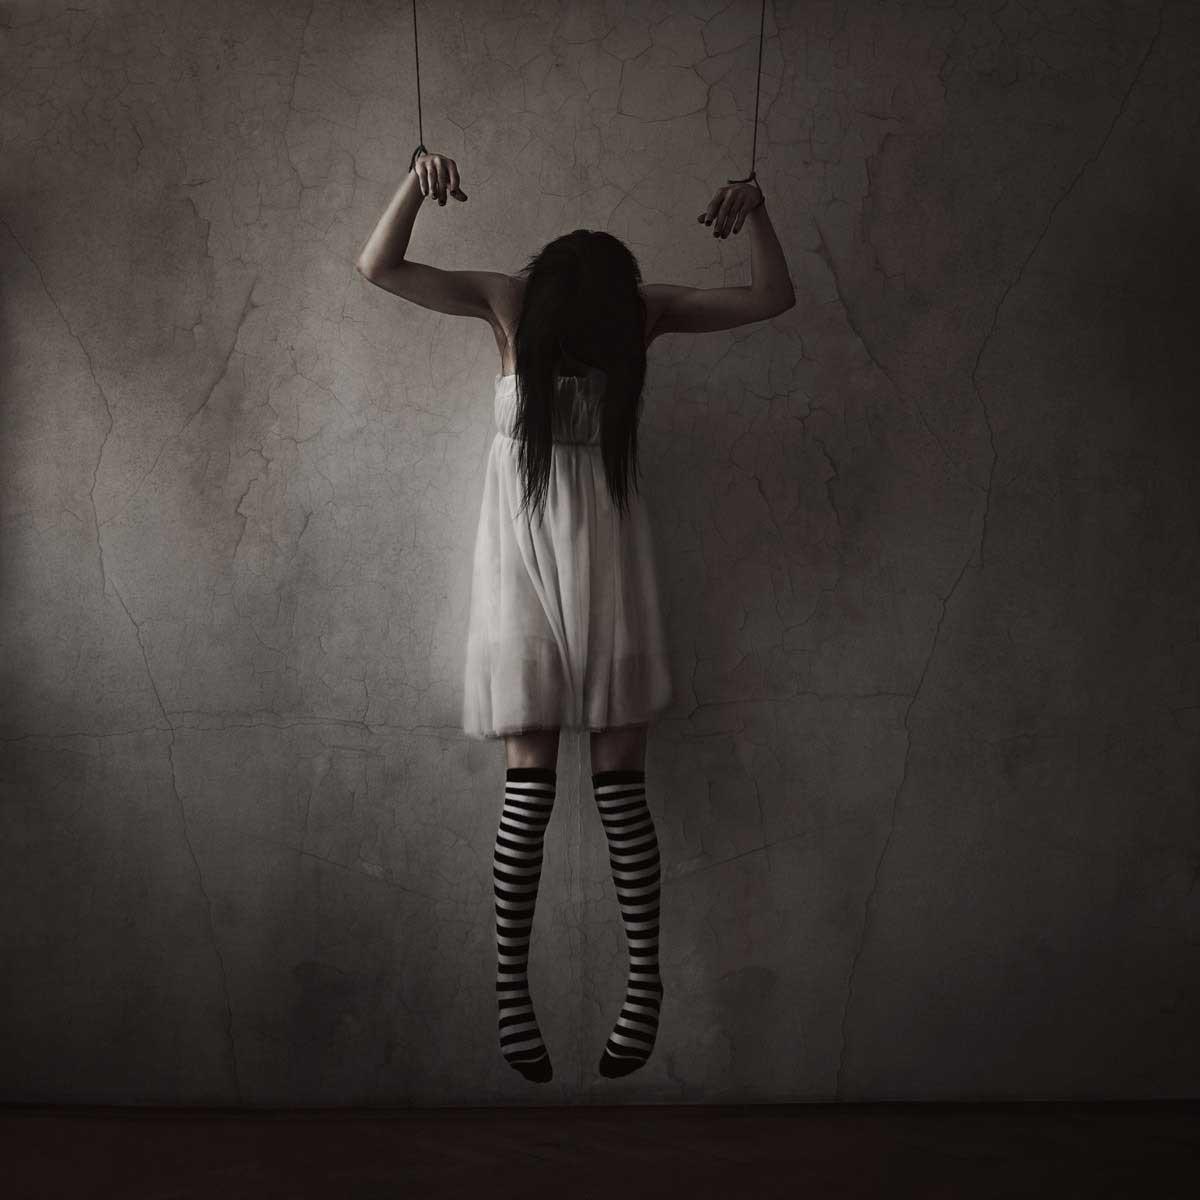 Marionette | Anja Matko